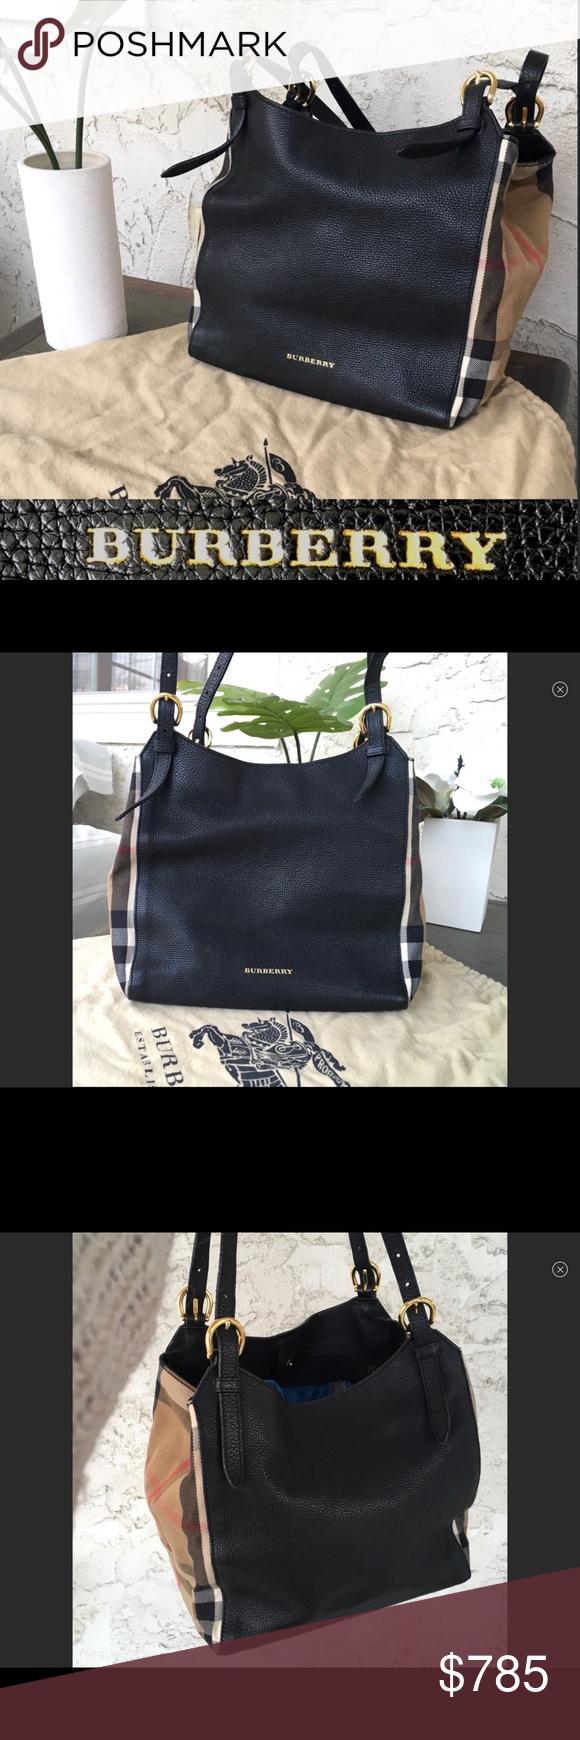 1096433c5975 Authentic Burberry Canterbury Bag Gorgeous